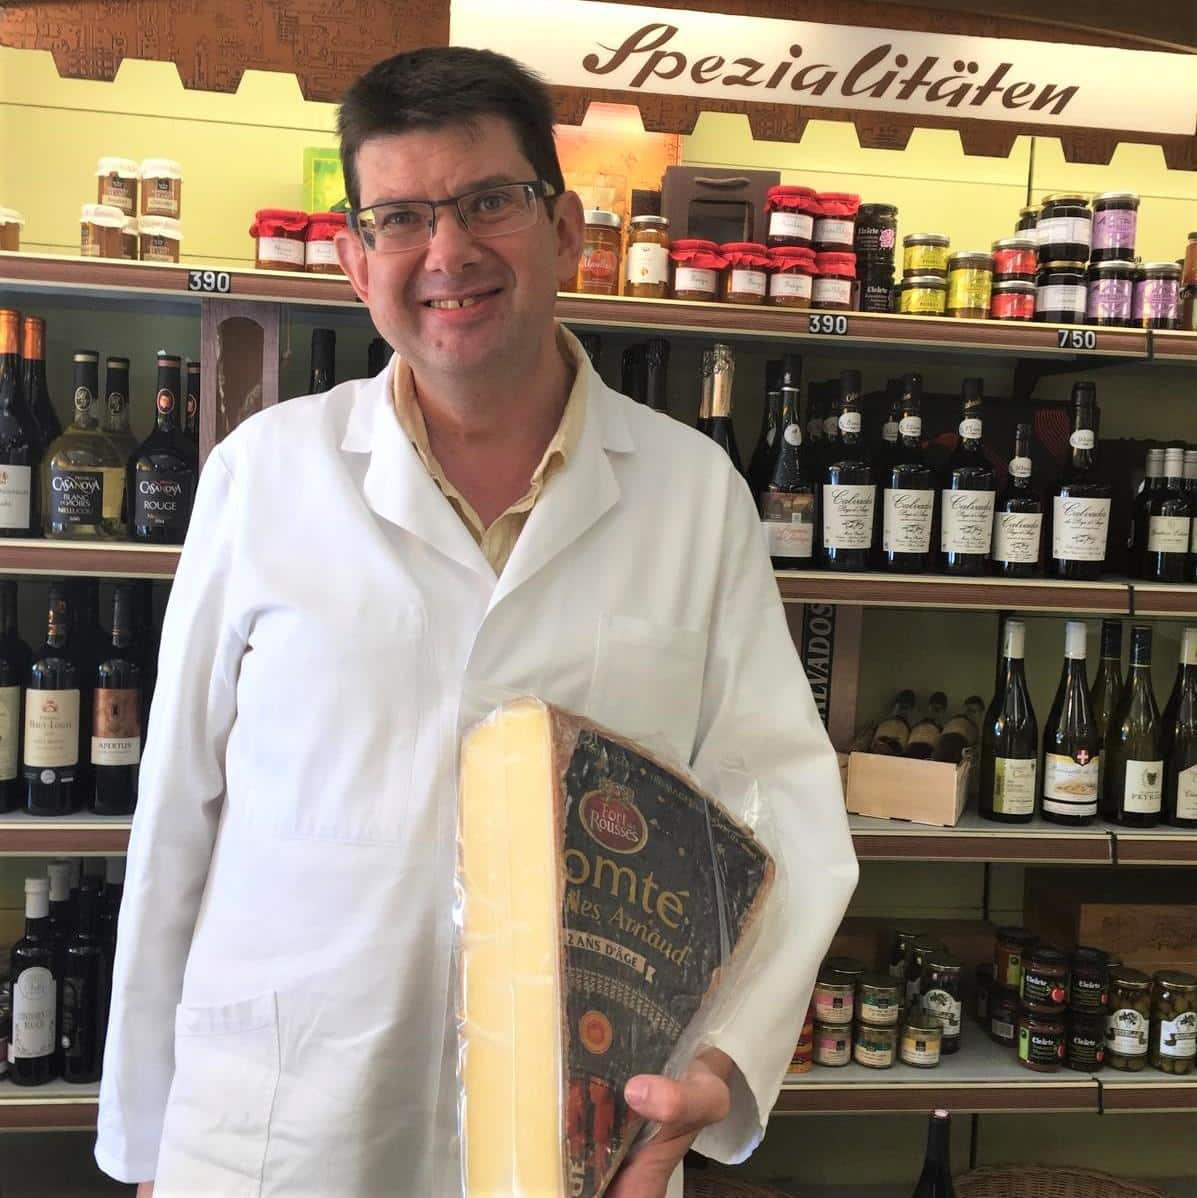 style hannover kaese schaub 1 - Käse-Schaub - Käse voller Tradition